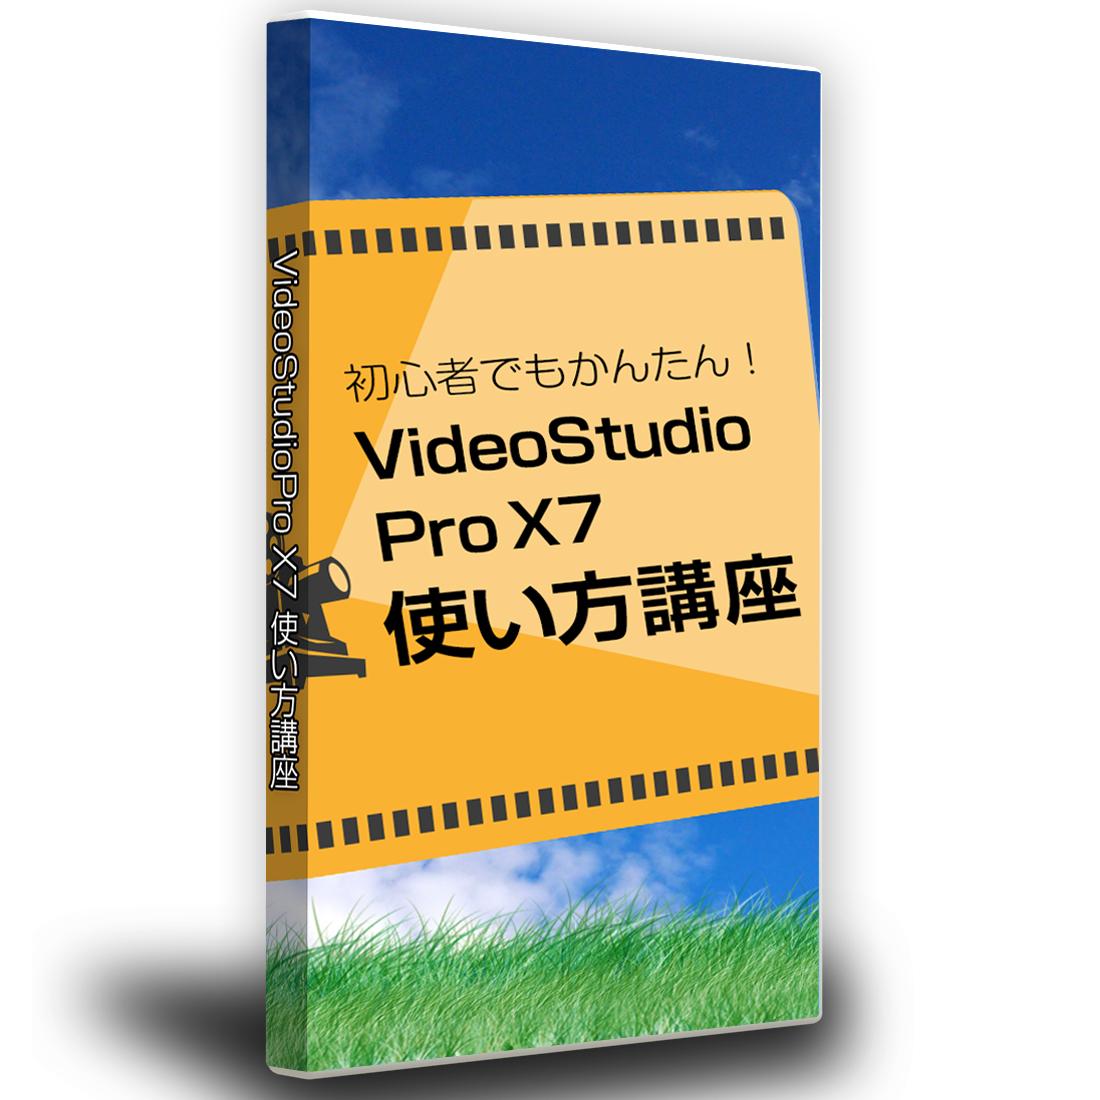 VideoStudio Pro X7使い方講座